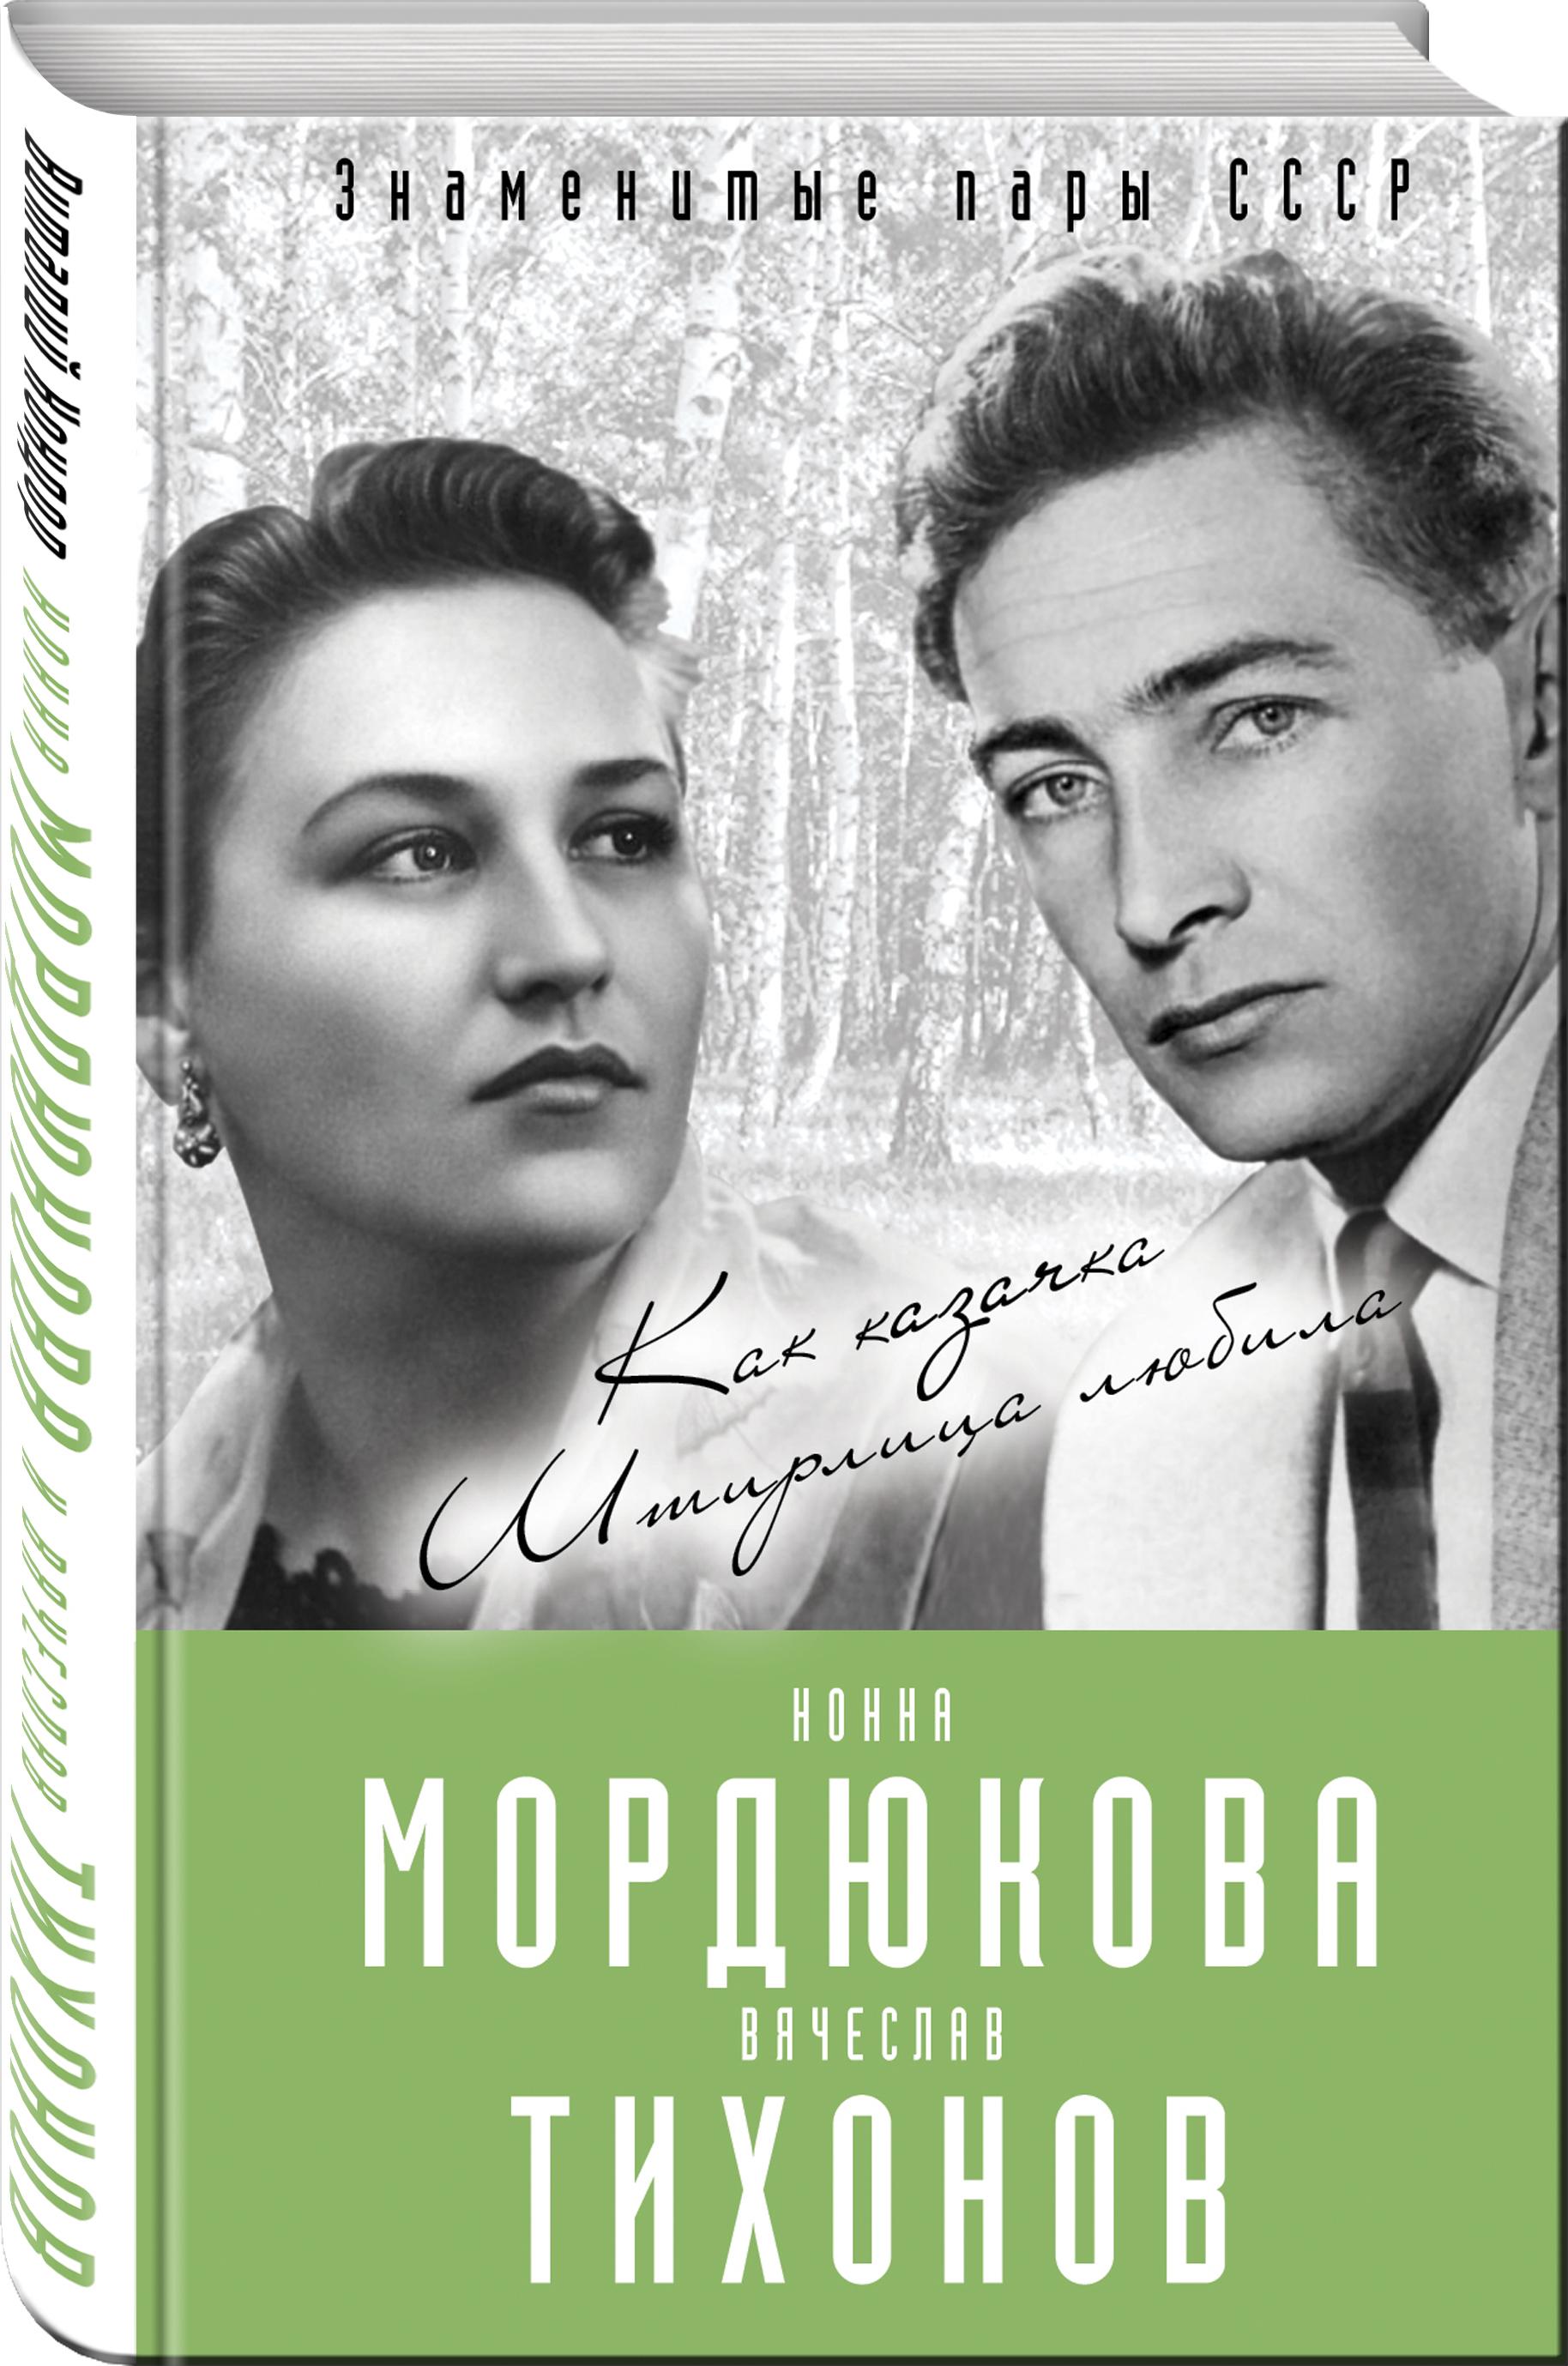 Виталий Кондор Нонна Мордюкова и Вячеслав Тихонов. Как казачка Штирлица любила